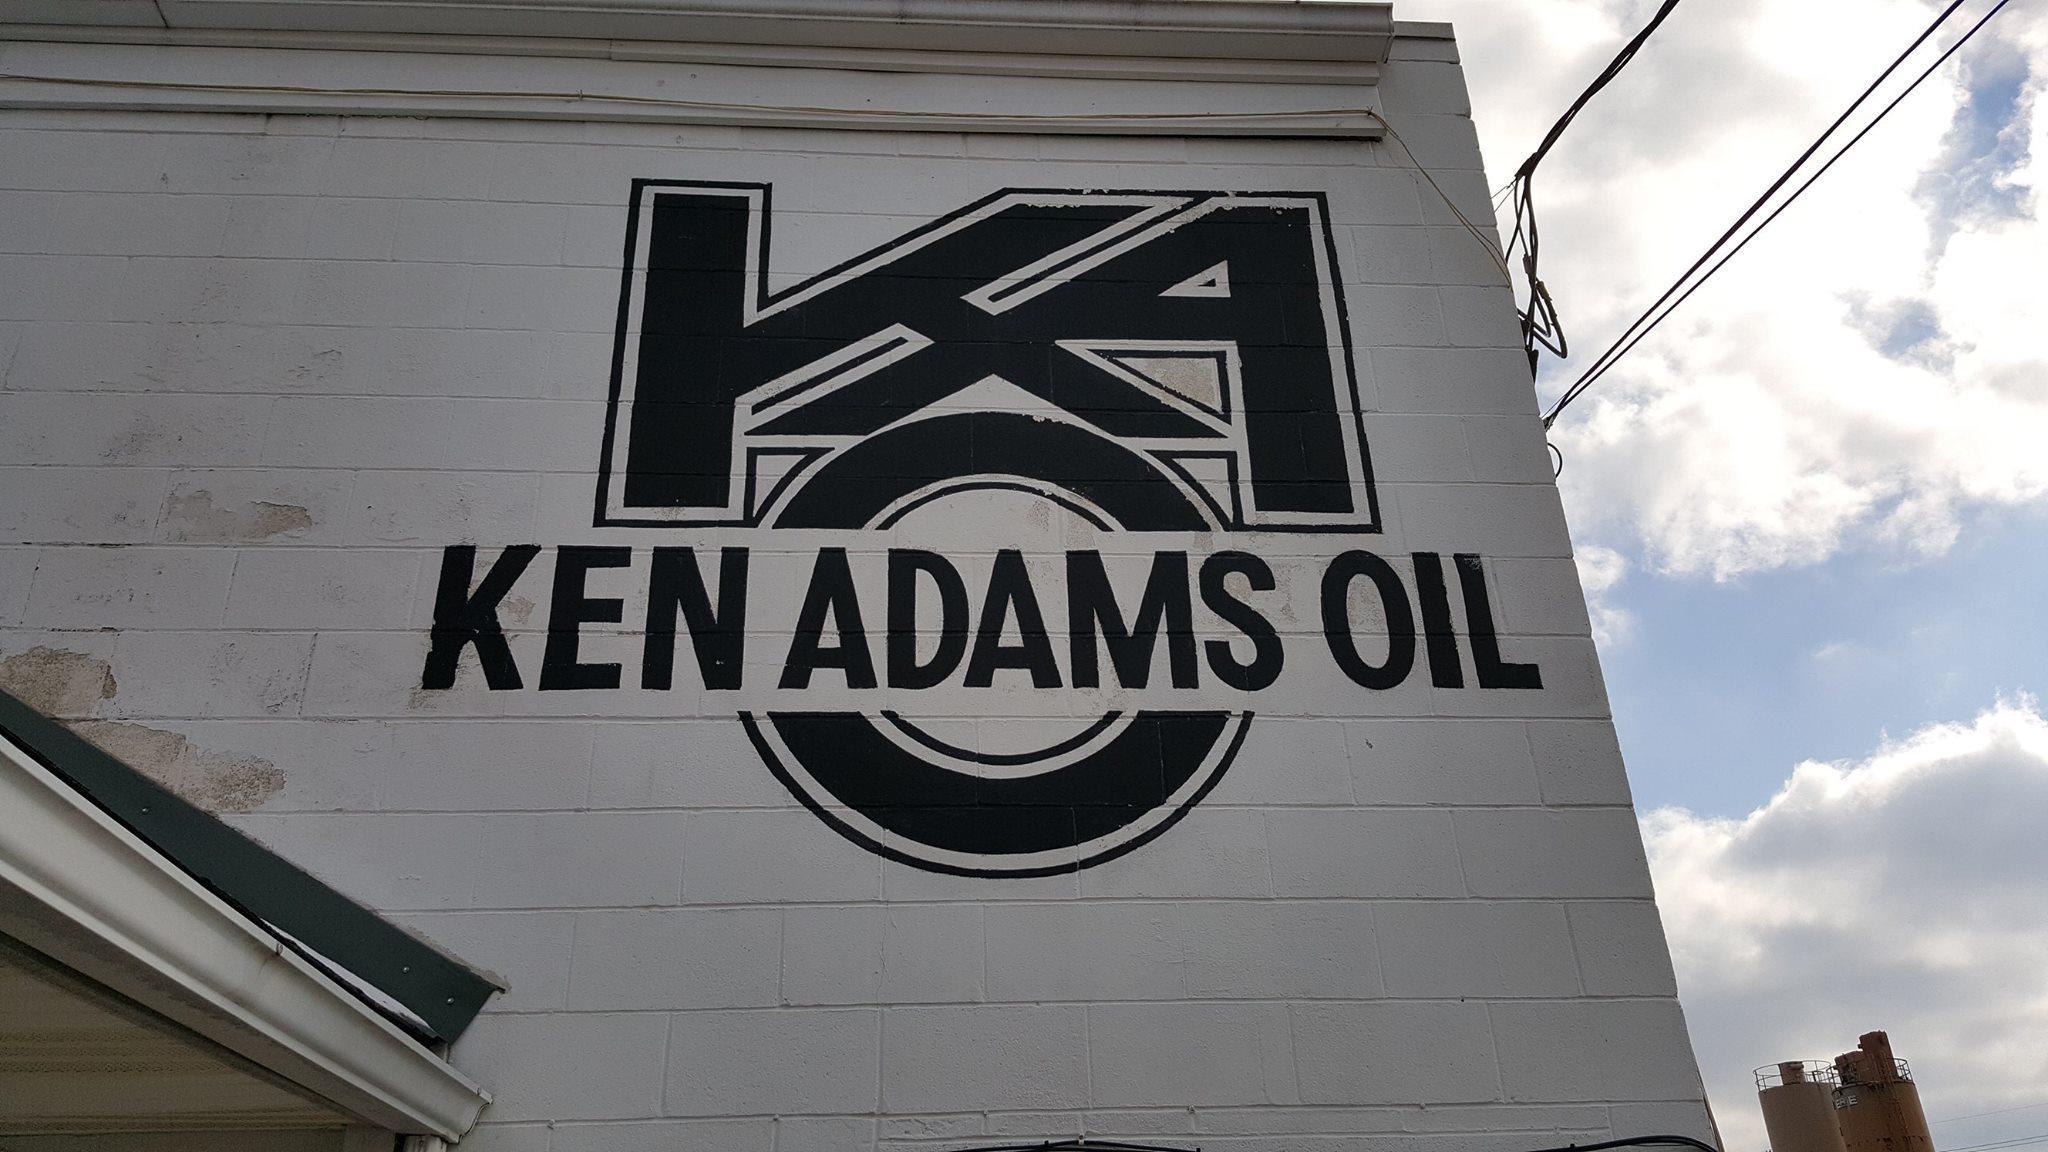 Ken Adams Oil Service Inc. image 1